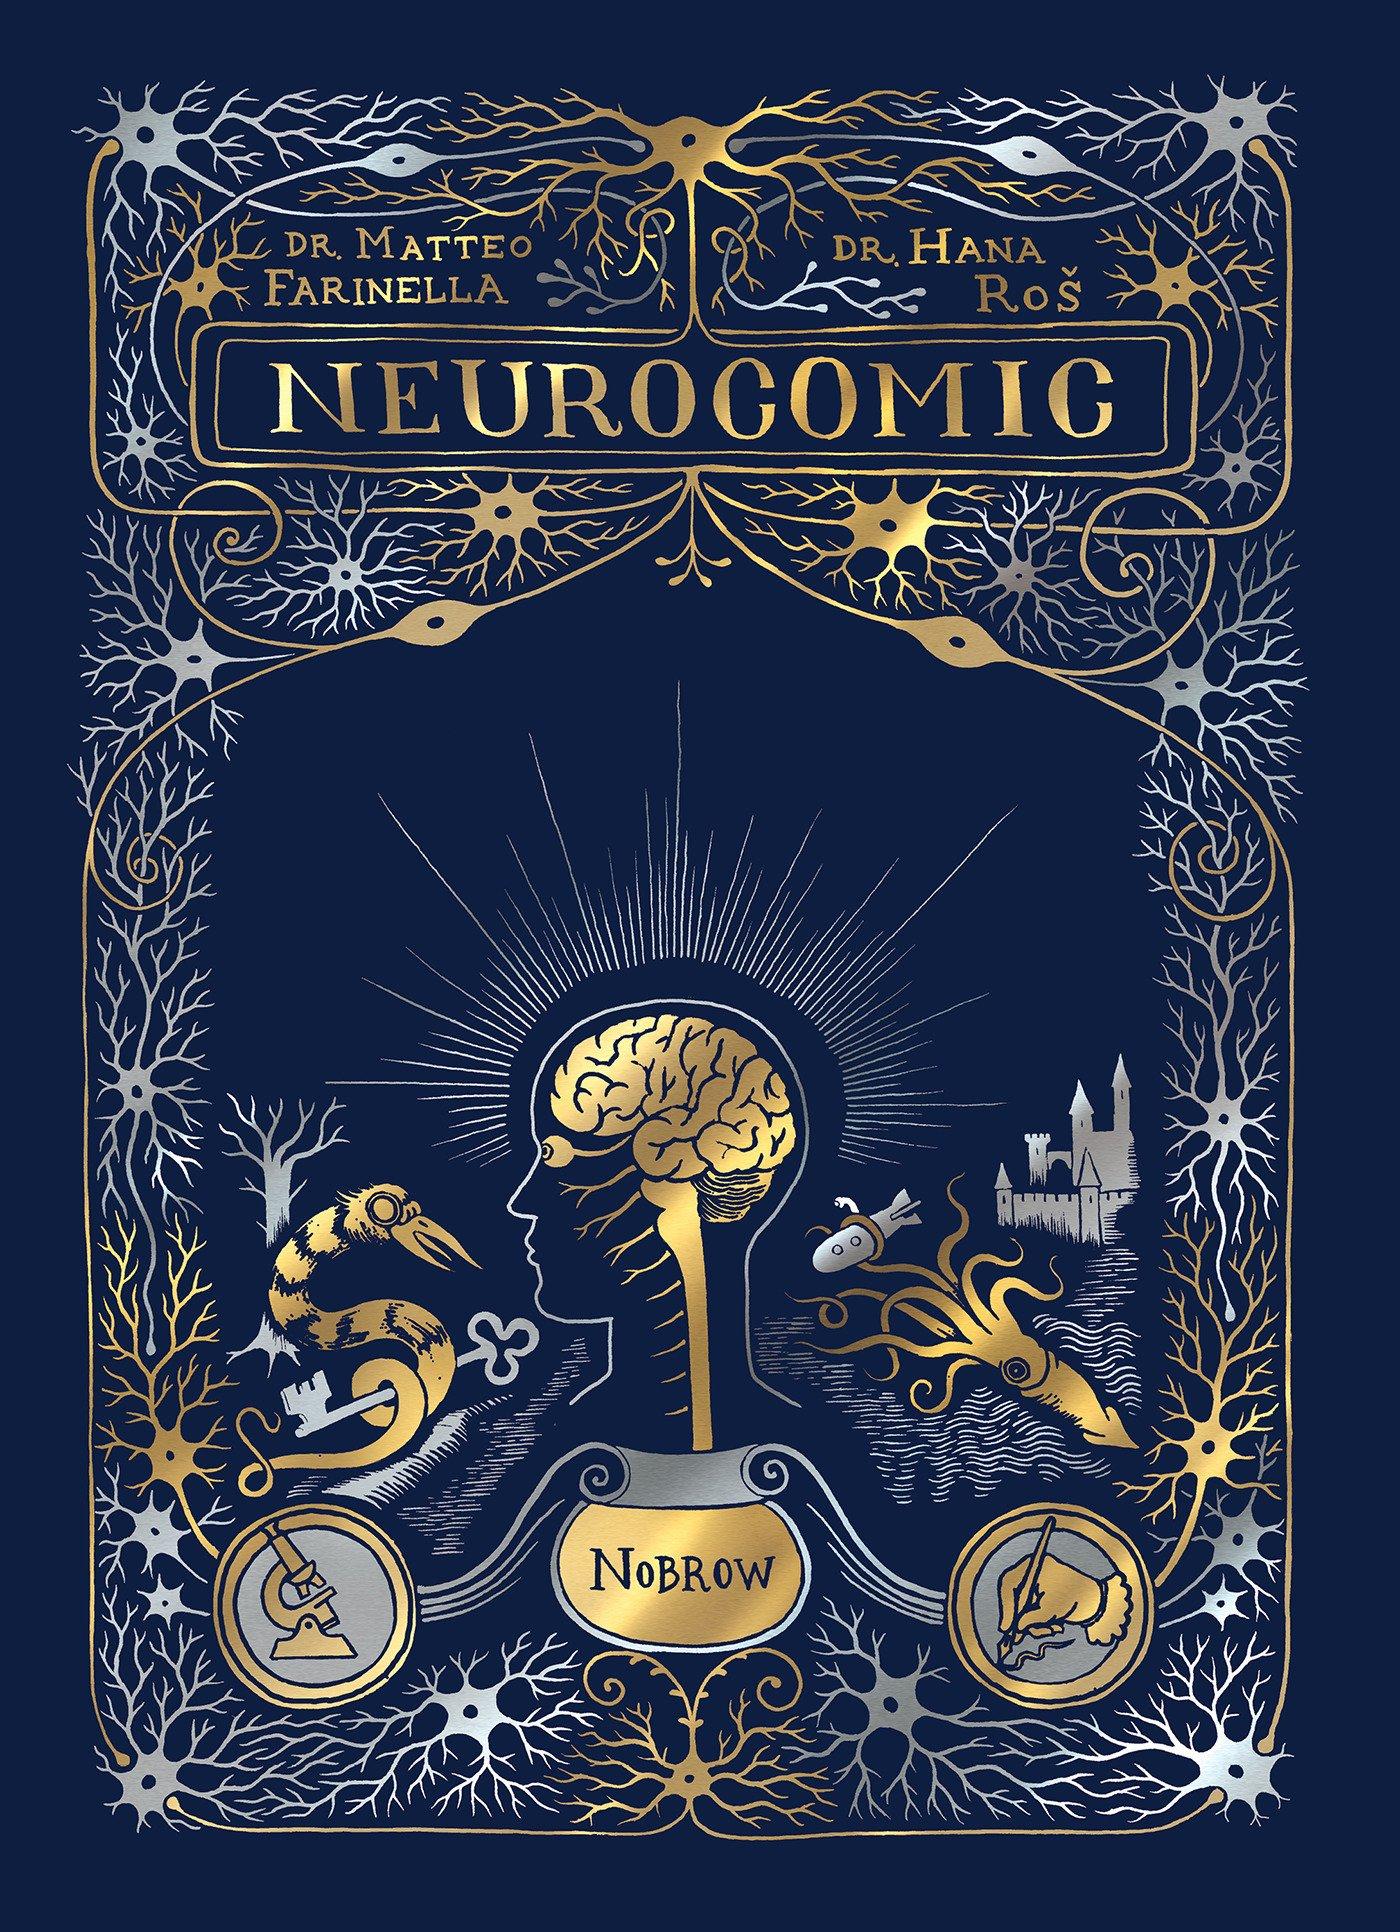 Neurocomic - Matteo Farinella